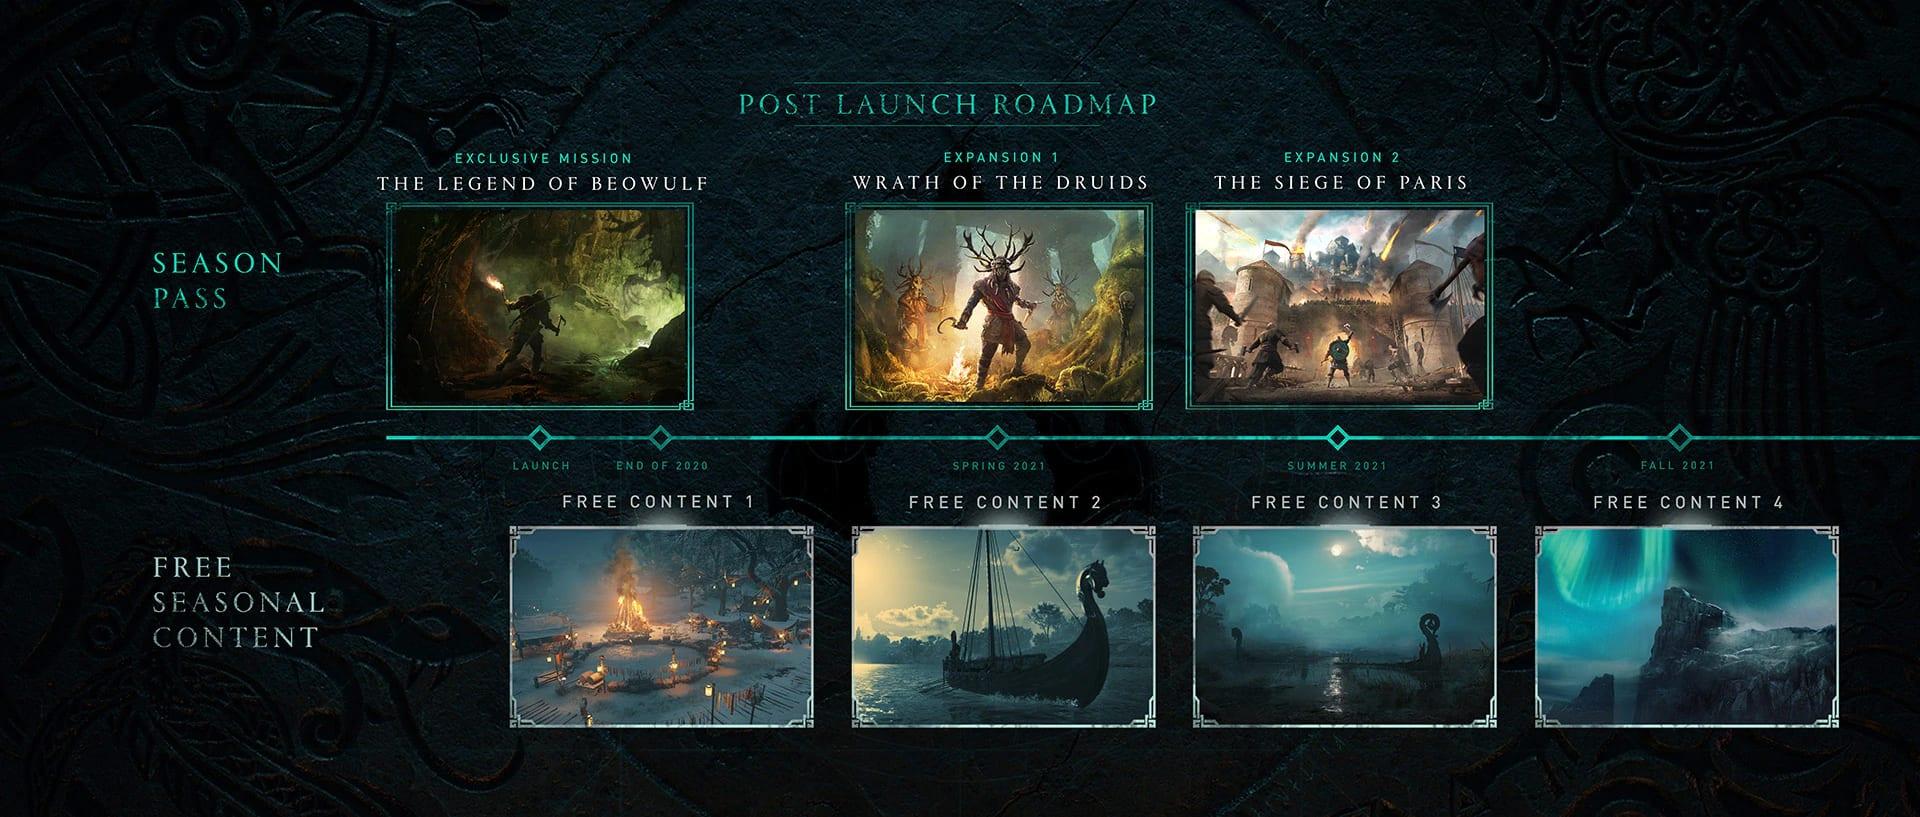 Assassin's Creed Valhalla Roadmap Post Launch Plan